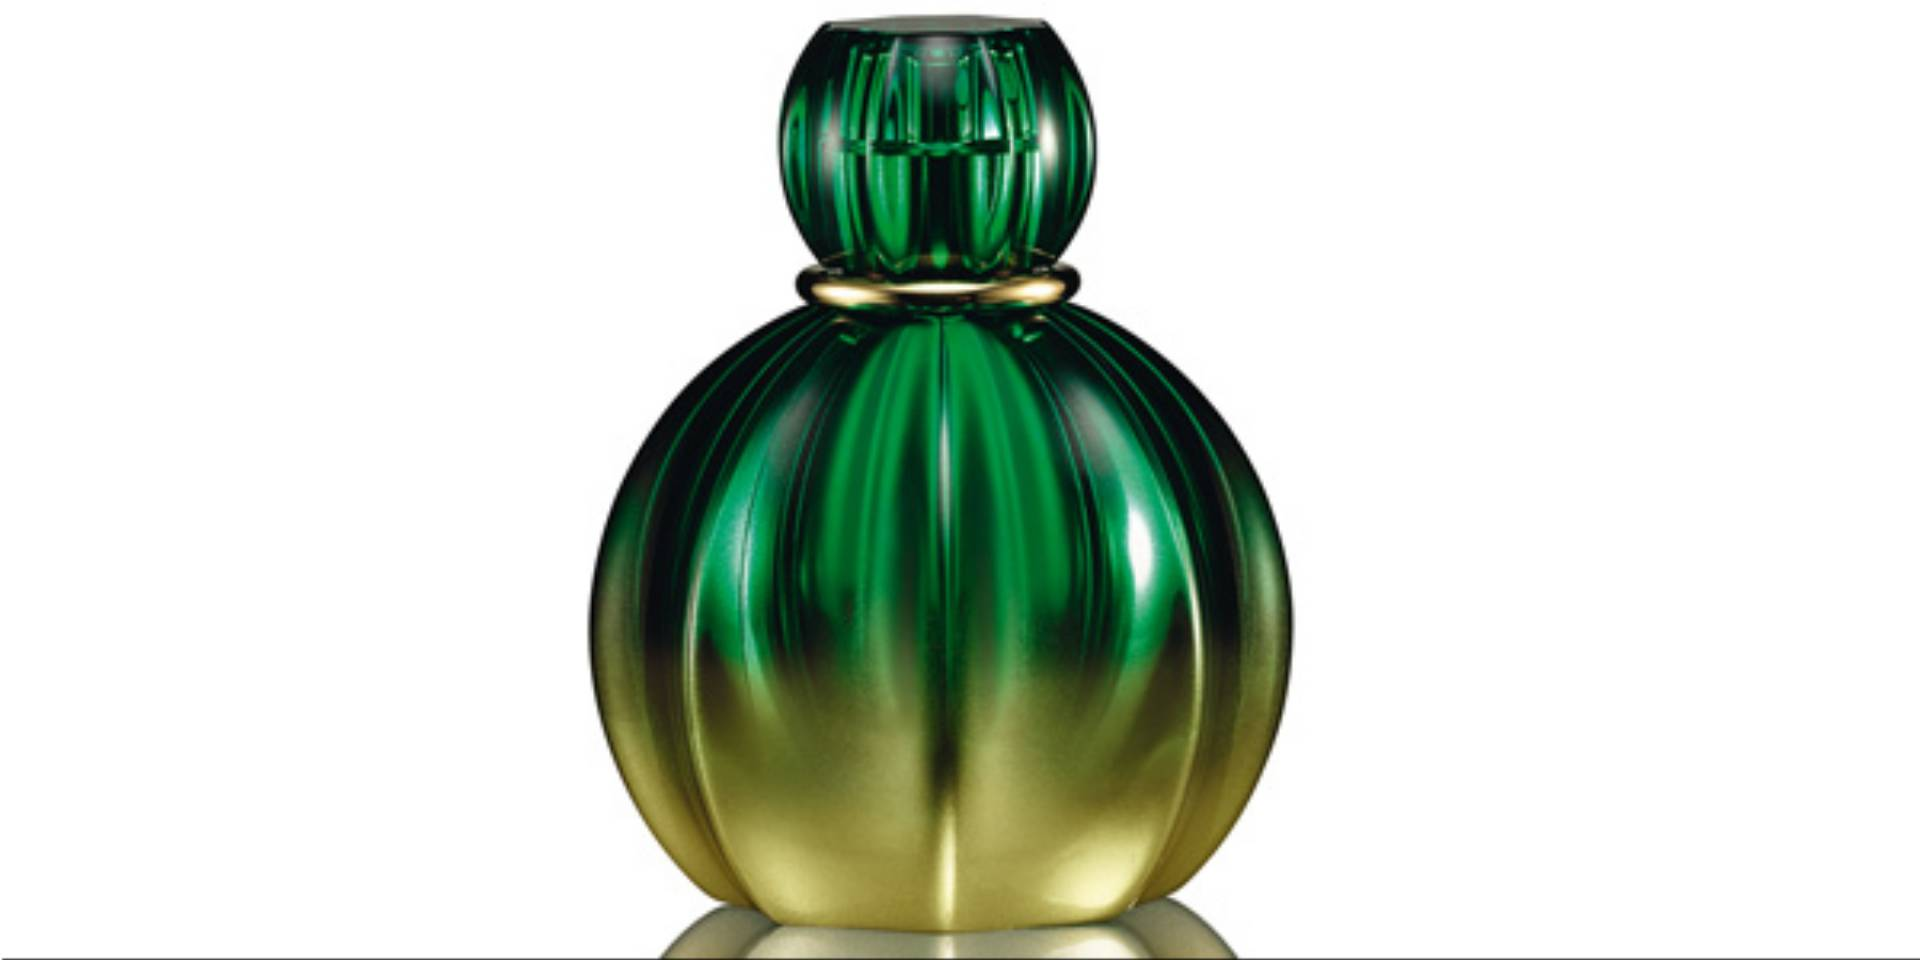 Mirage ? nowa woda perfumowana od Oriflame